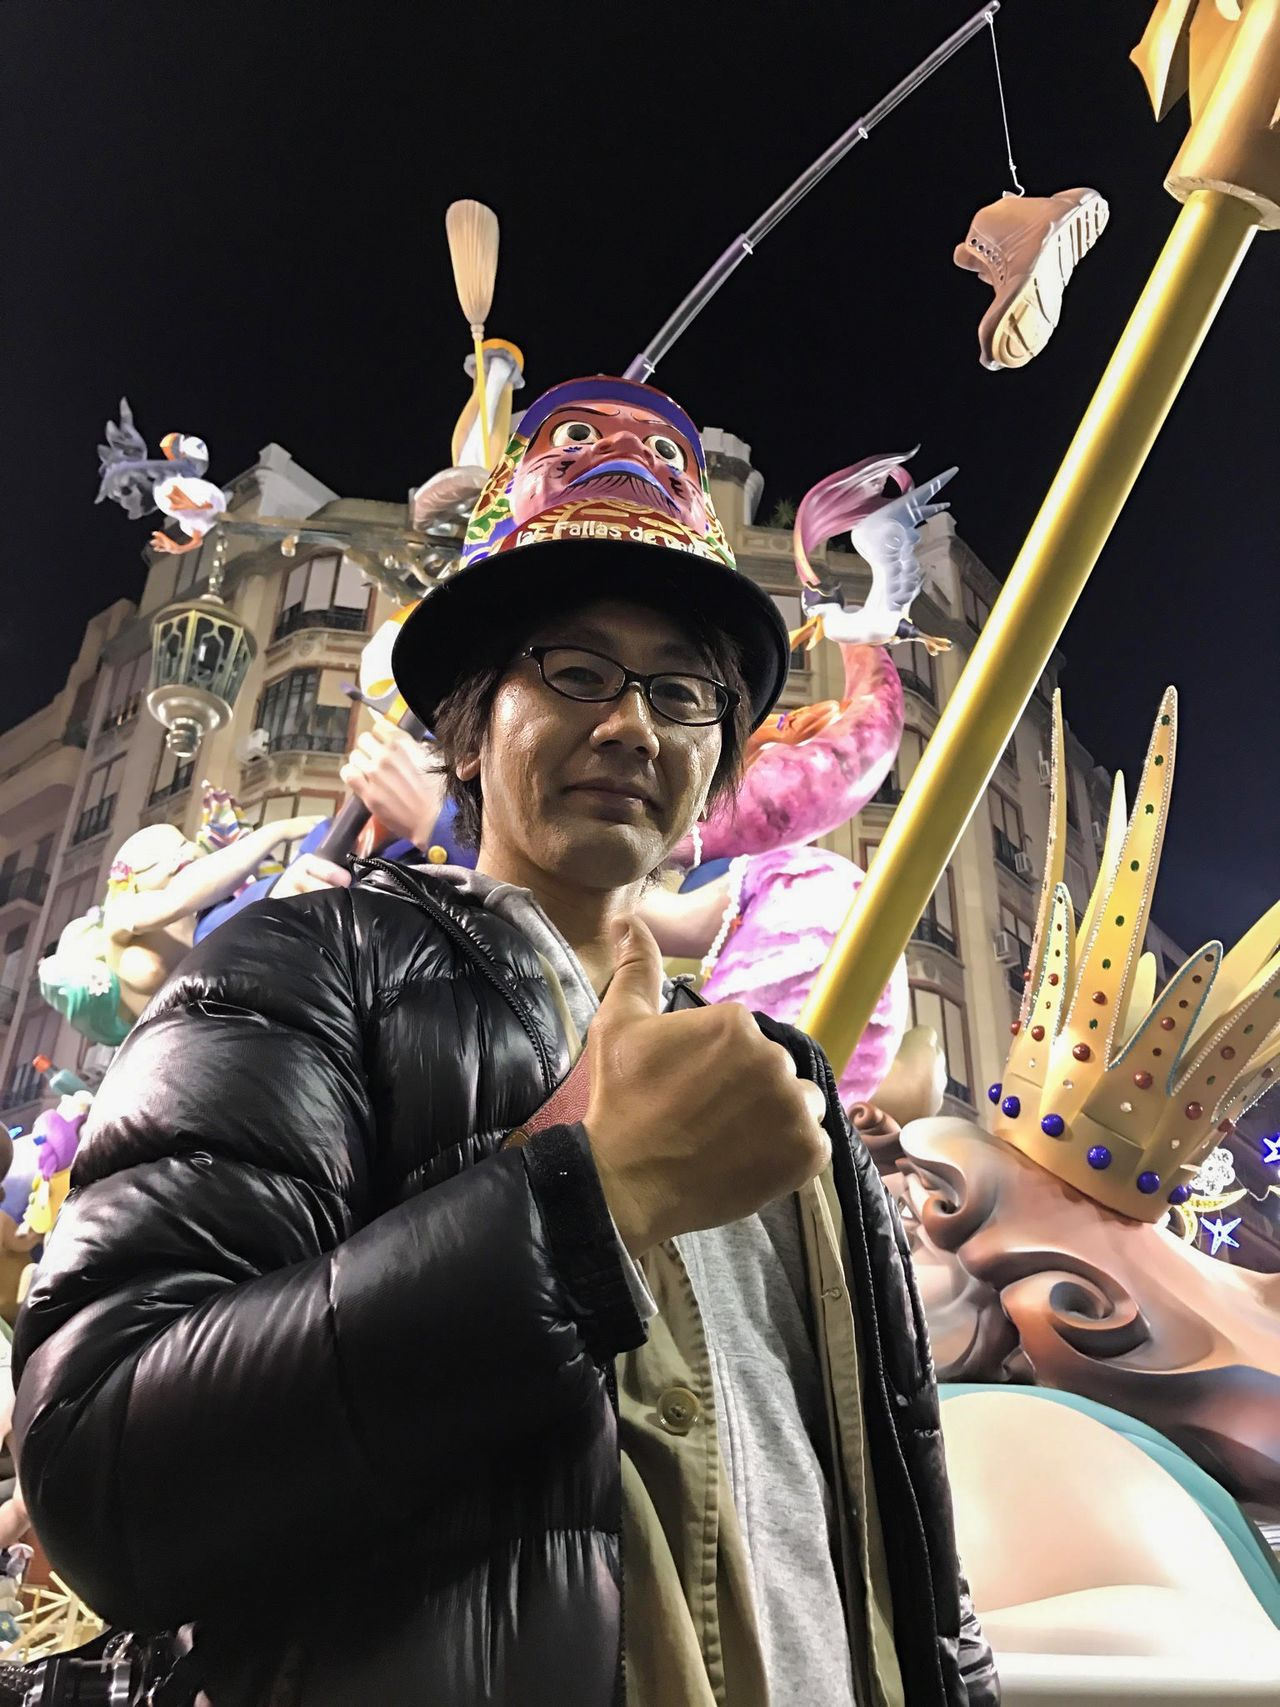 Хасимото на празднике Лас Фальяс в шляпе Михару дарума (фото Хасимото Сёити)